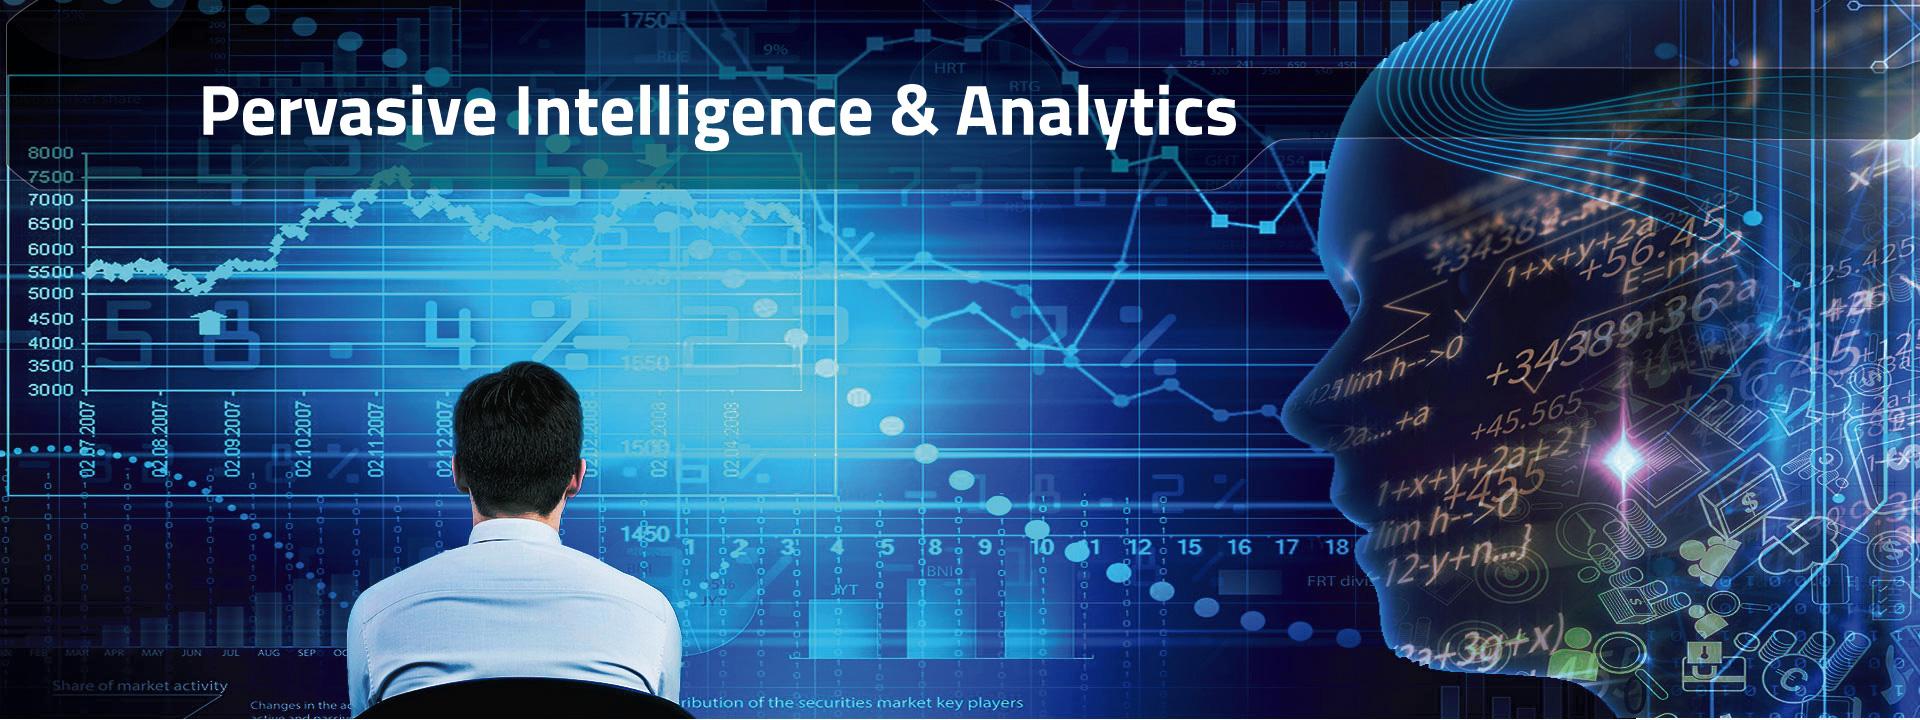 pervasive-intelligence-and-analitycs